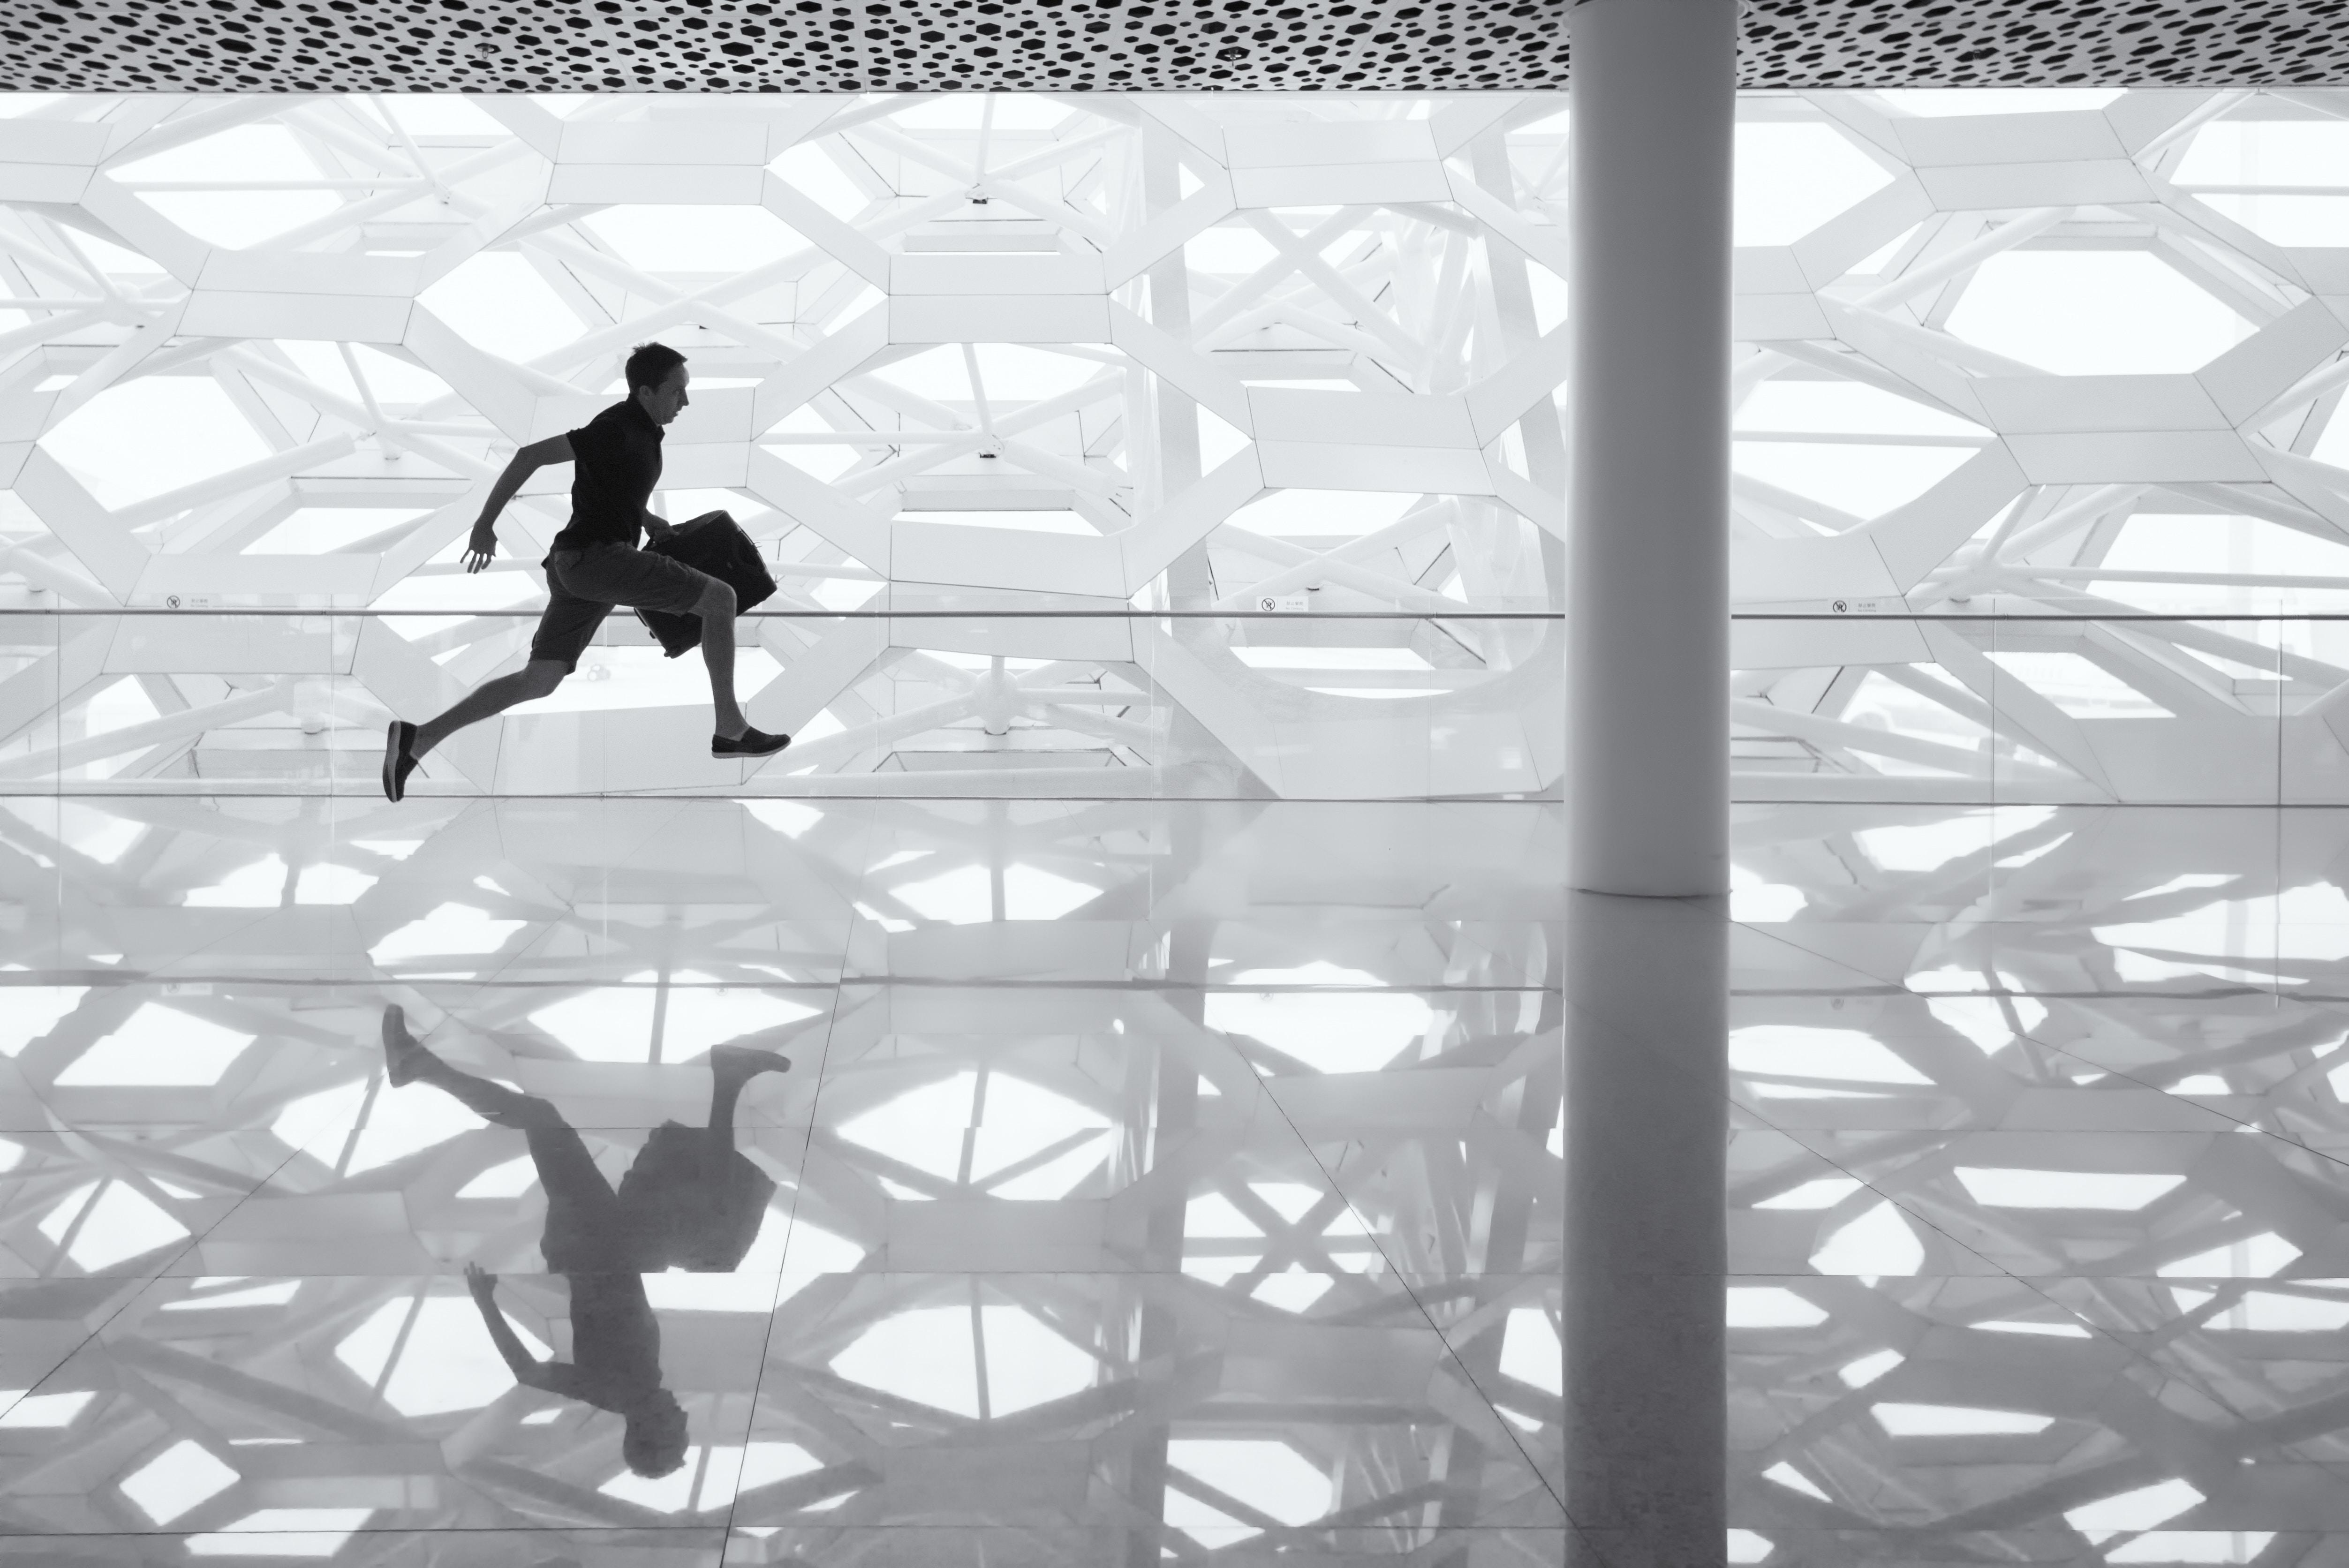 A man running with a briefcase at Shenzhen Bao'an International Airport